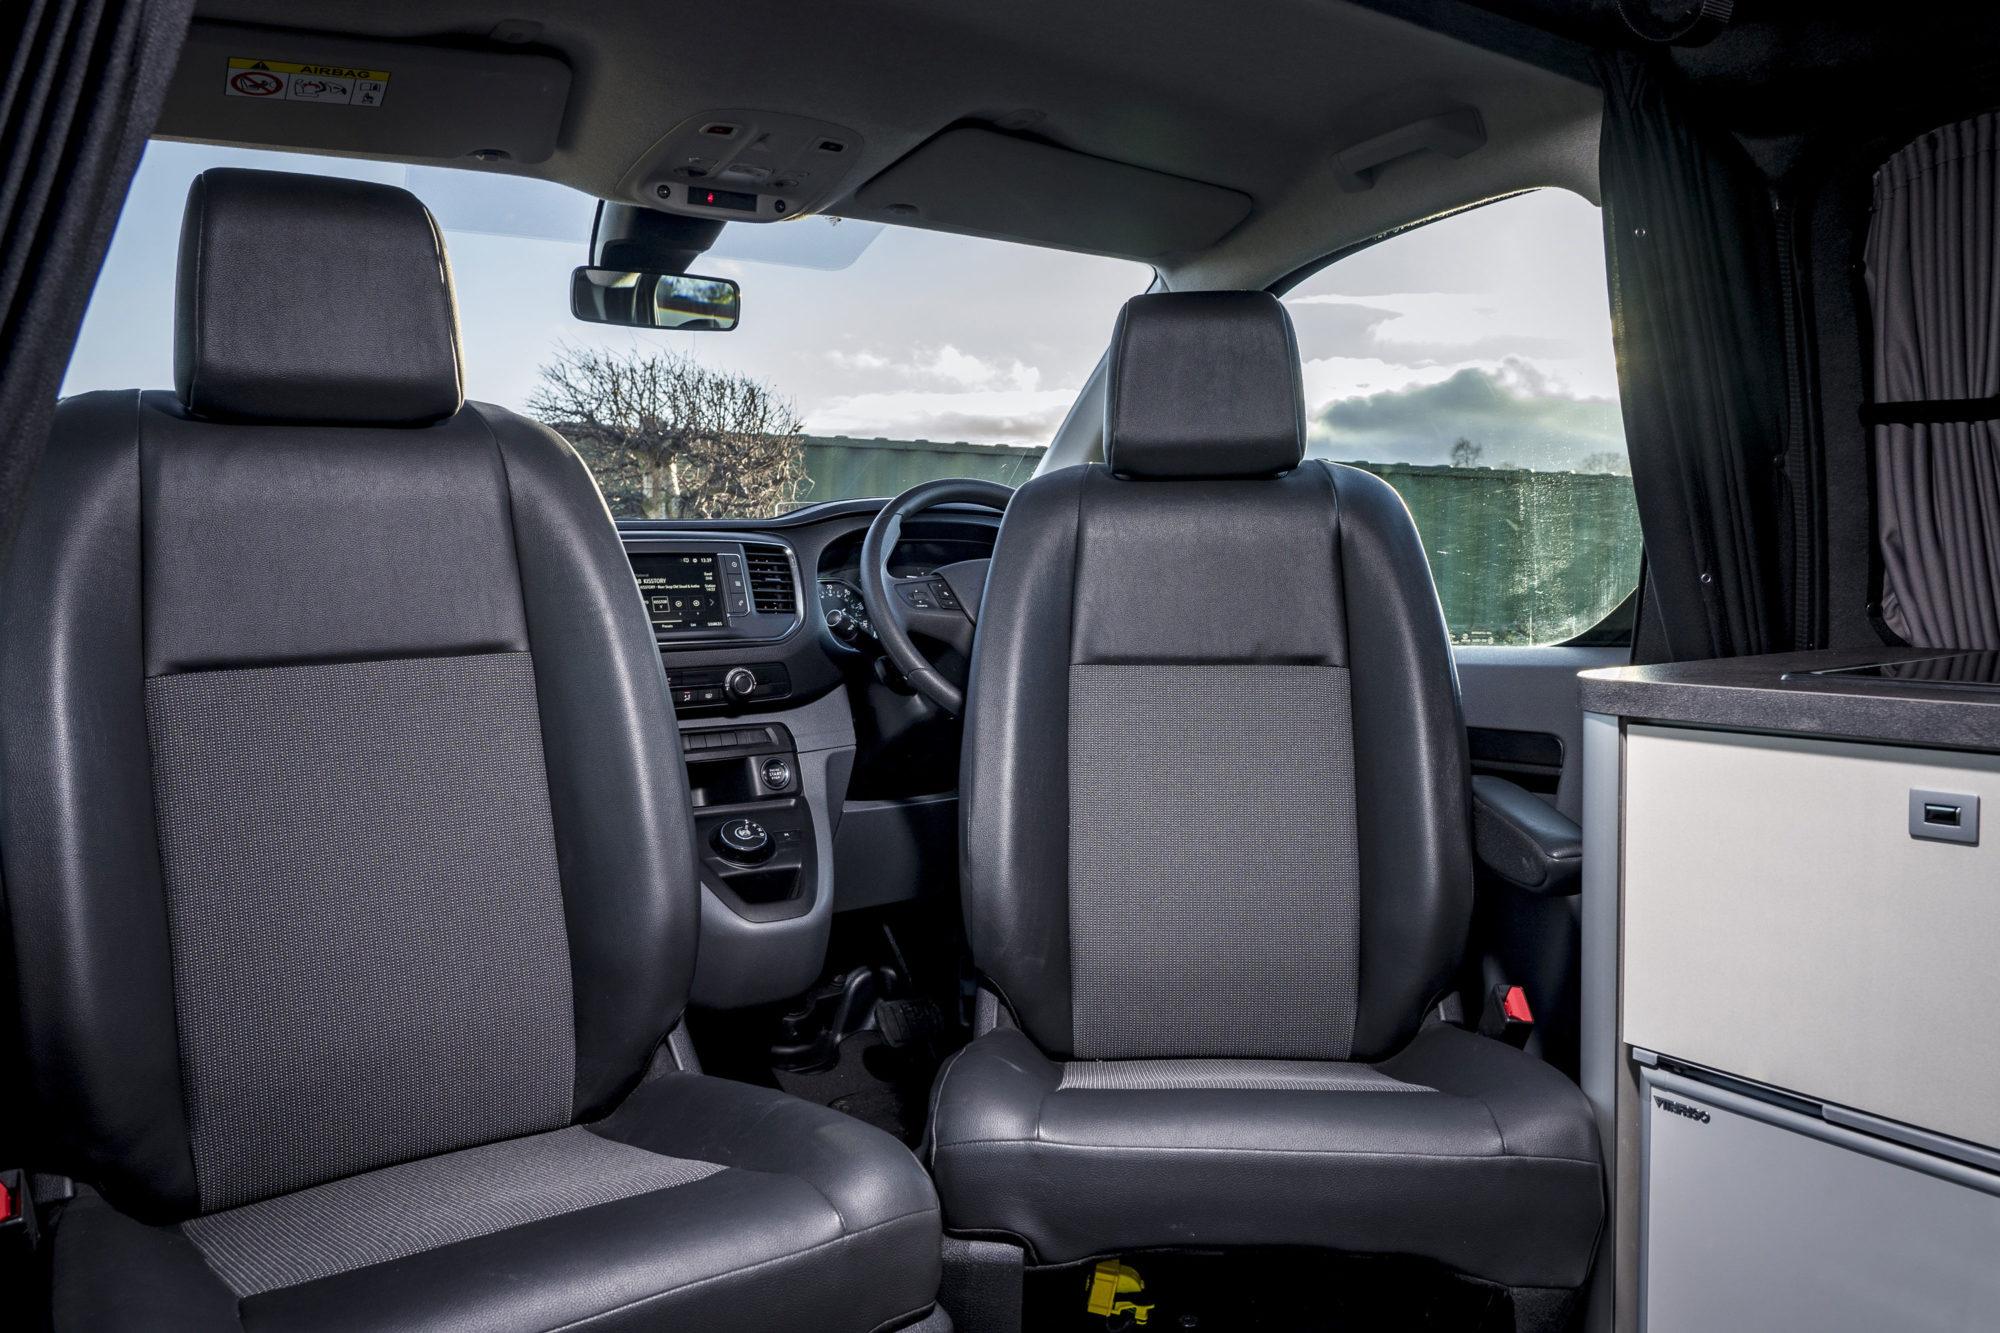 Vauxhall Vivaro Elite Campervan Chairs